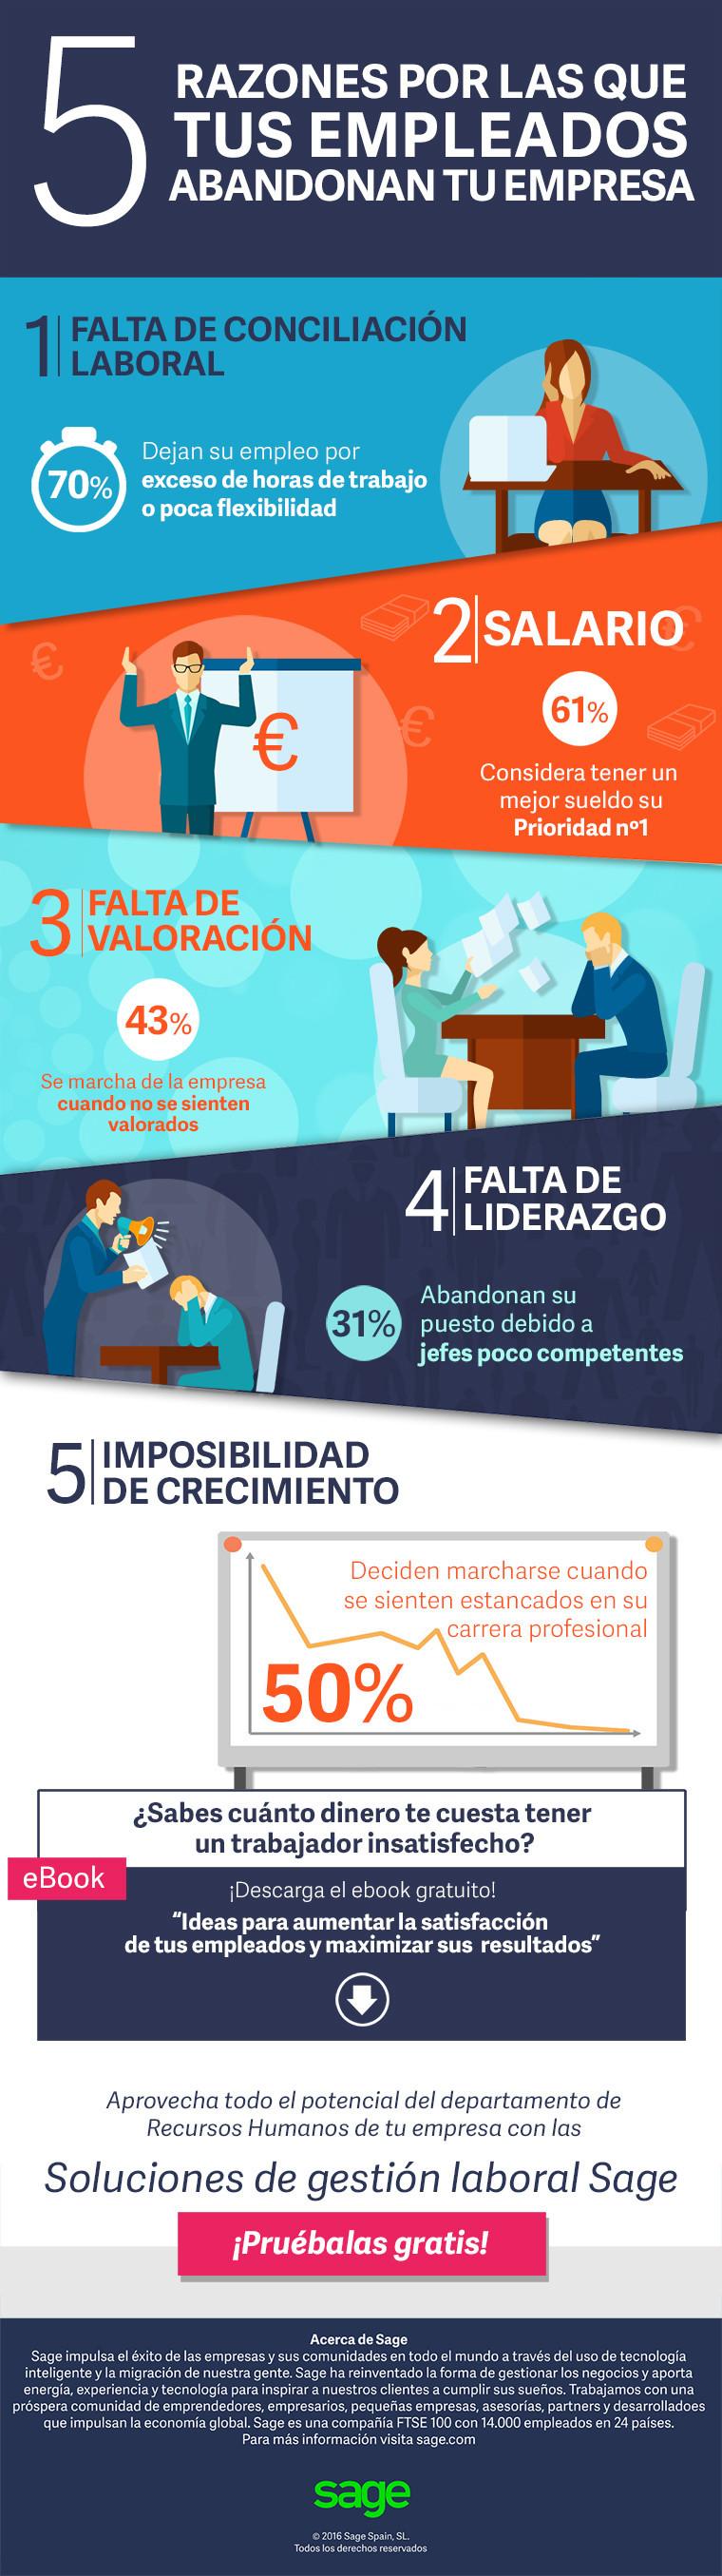 5-razones-empleados-abandonan-empresa-infografia